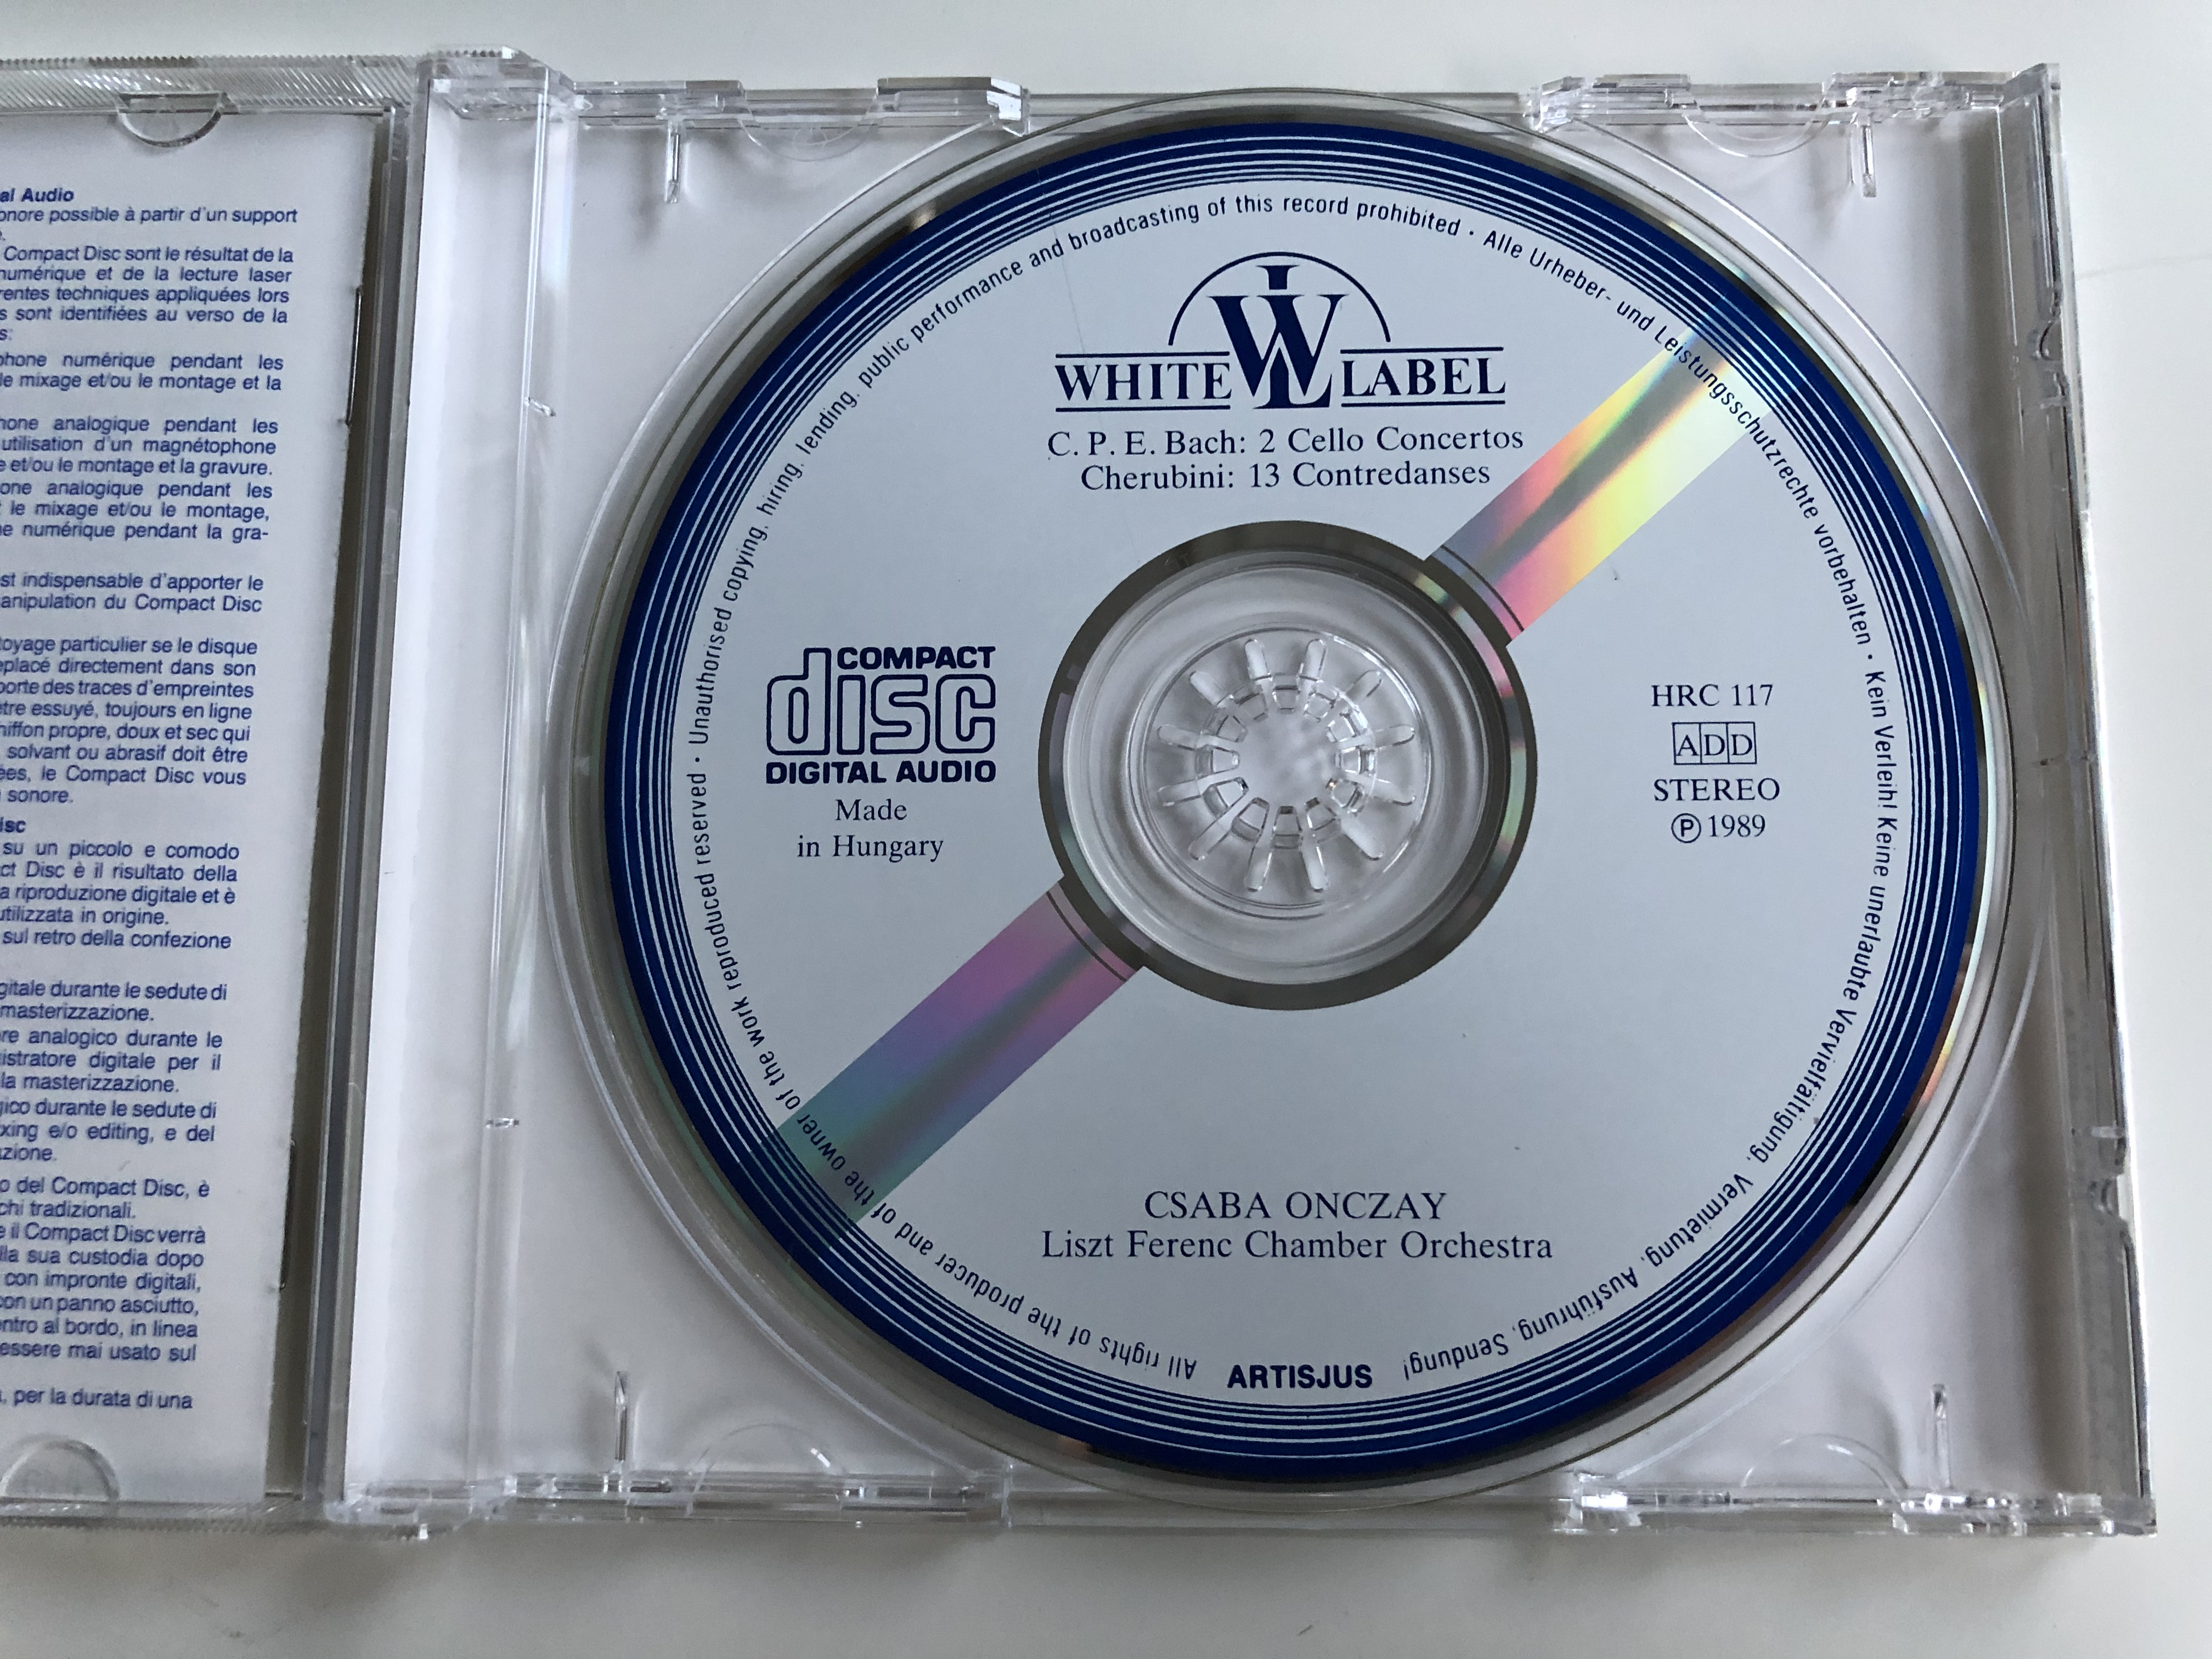 c.p.e.-bach-cello-concertos-cherubin-13-contredanses-csaba-onczay-liszt-ferenc-chamber-orchestra-white-label-audio-cd-1989-stereo-hrc-117-5-.jpg